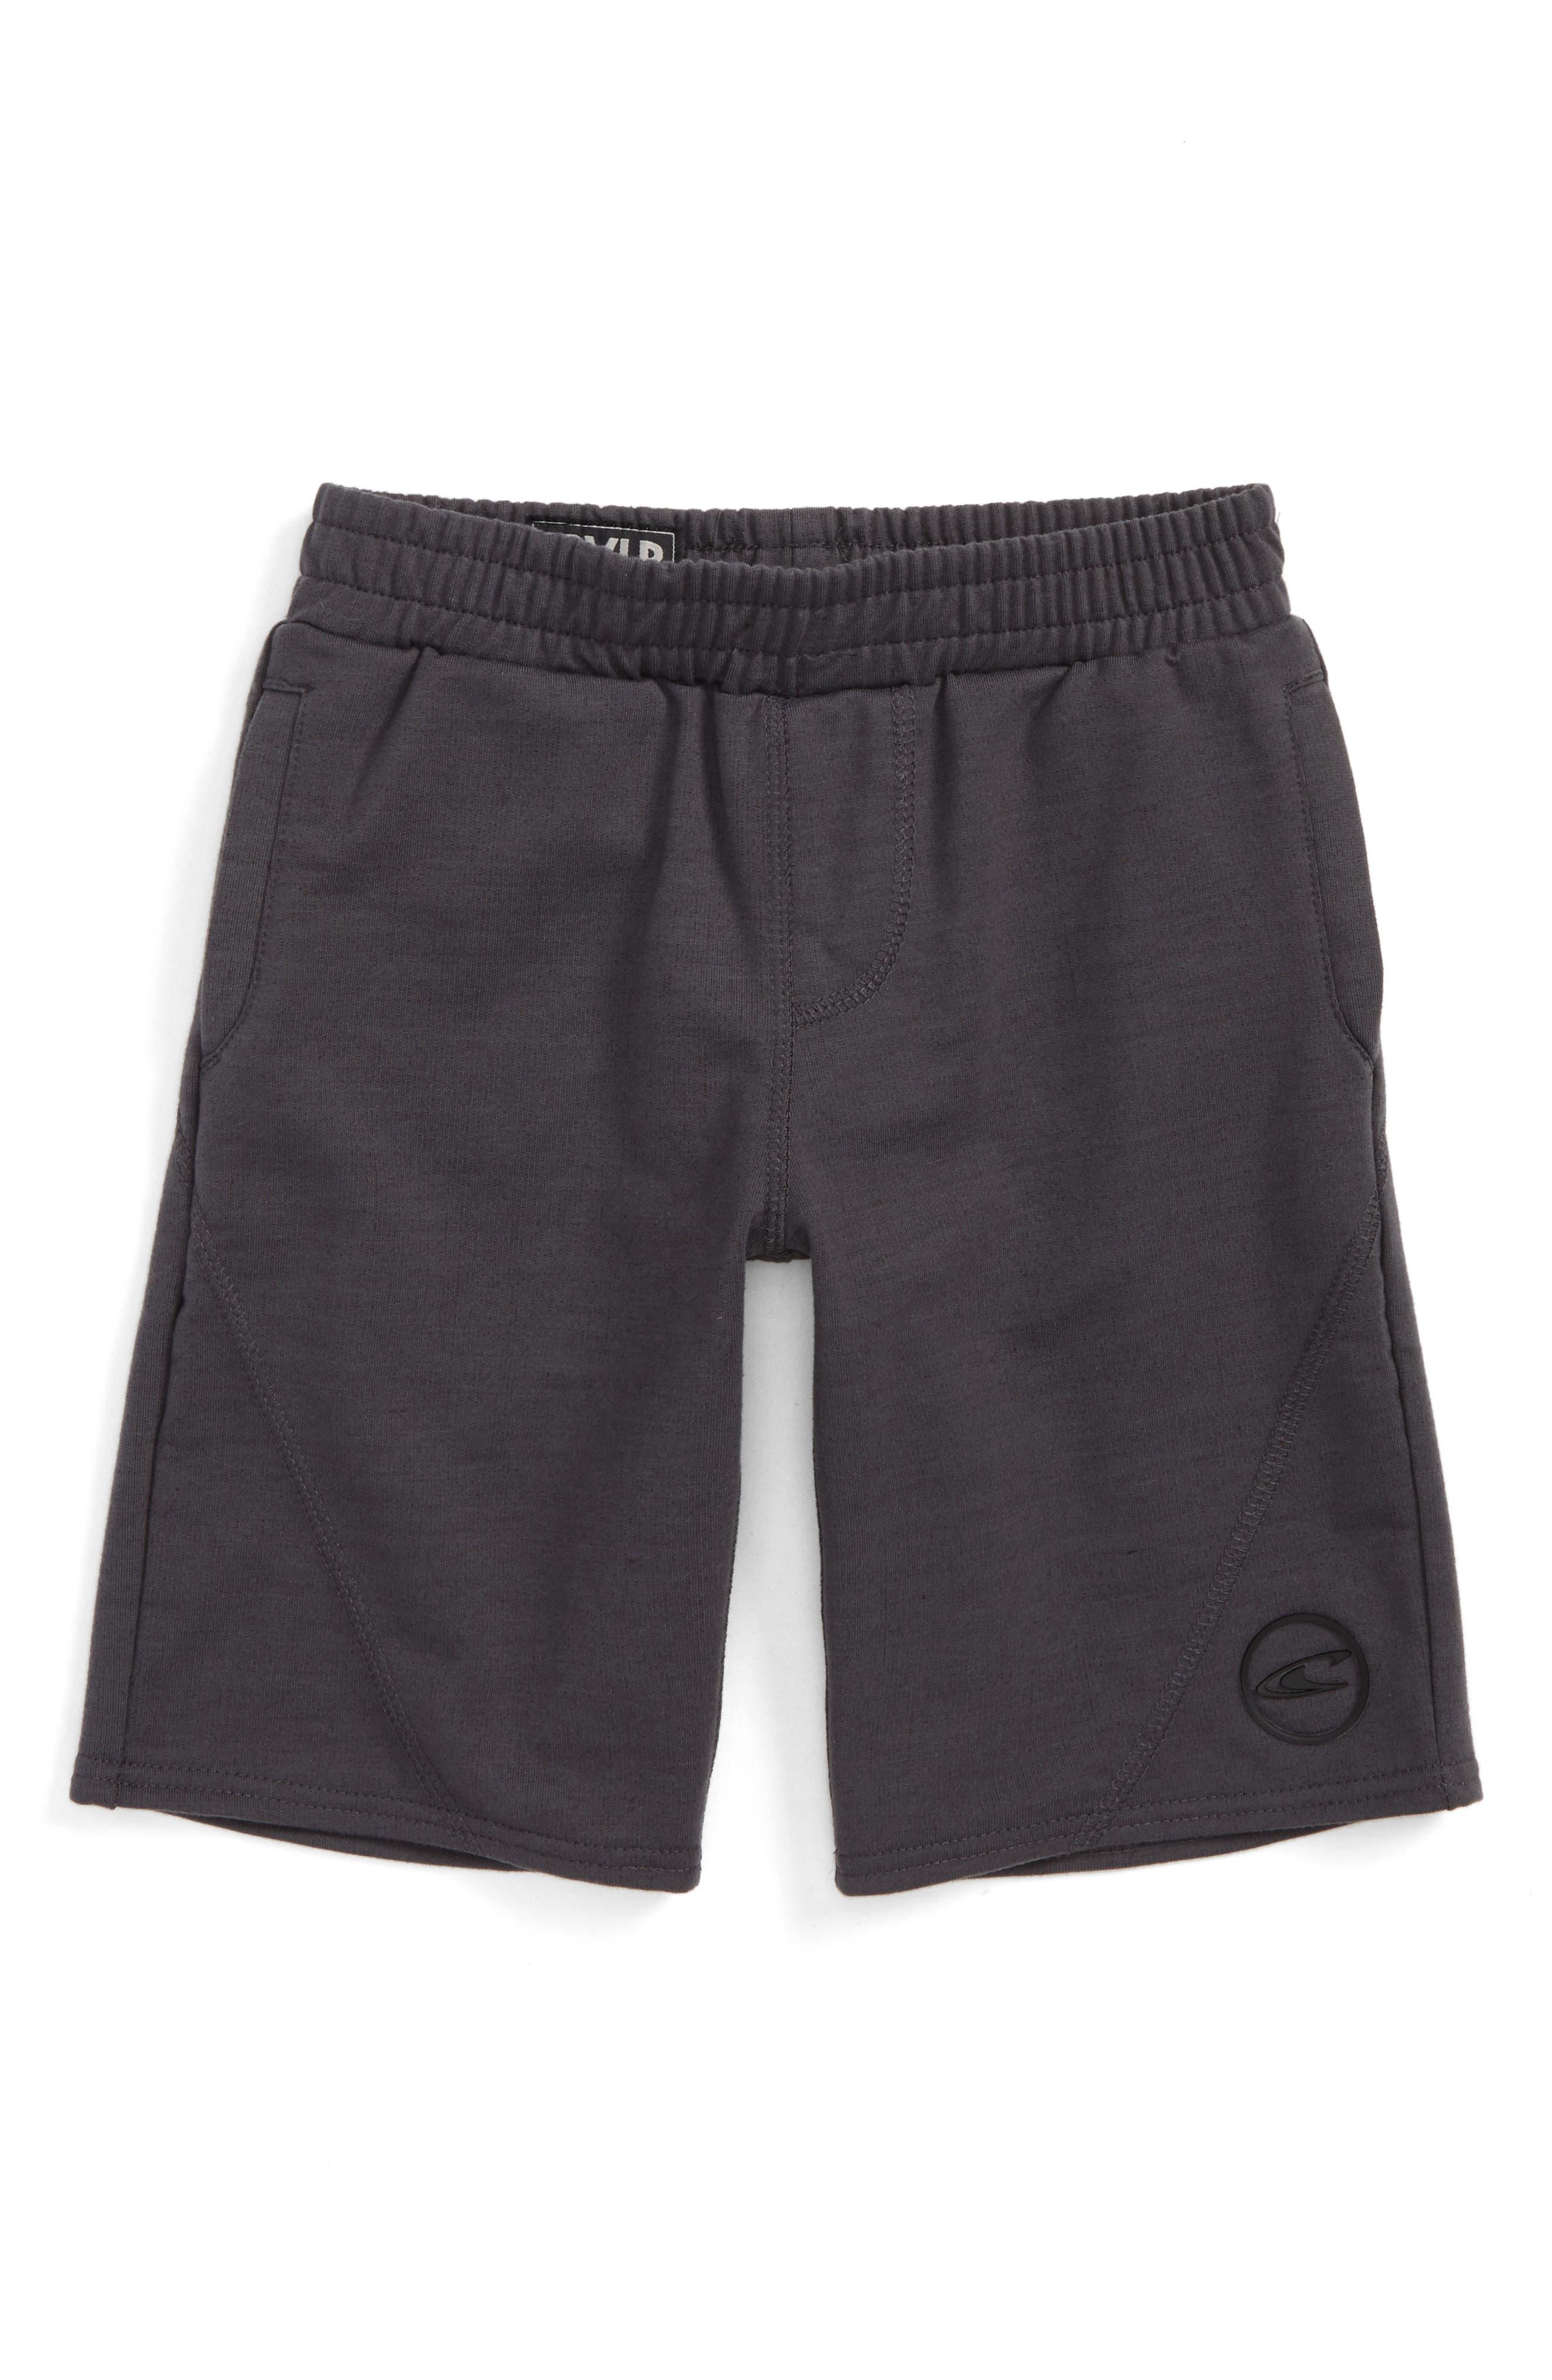 Main Image - O'Neill Traveler Knit Shorts (Little Boys)